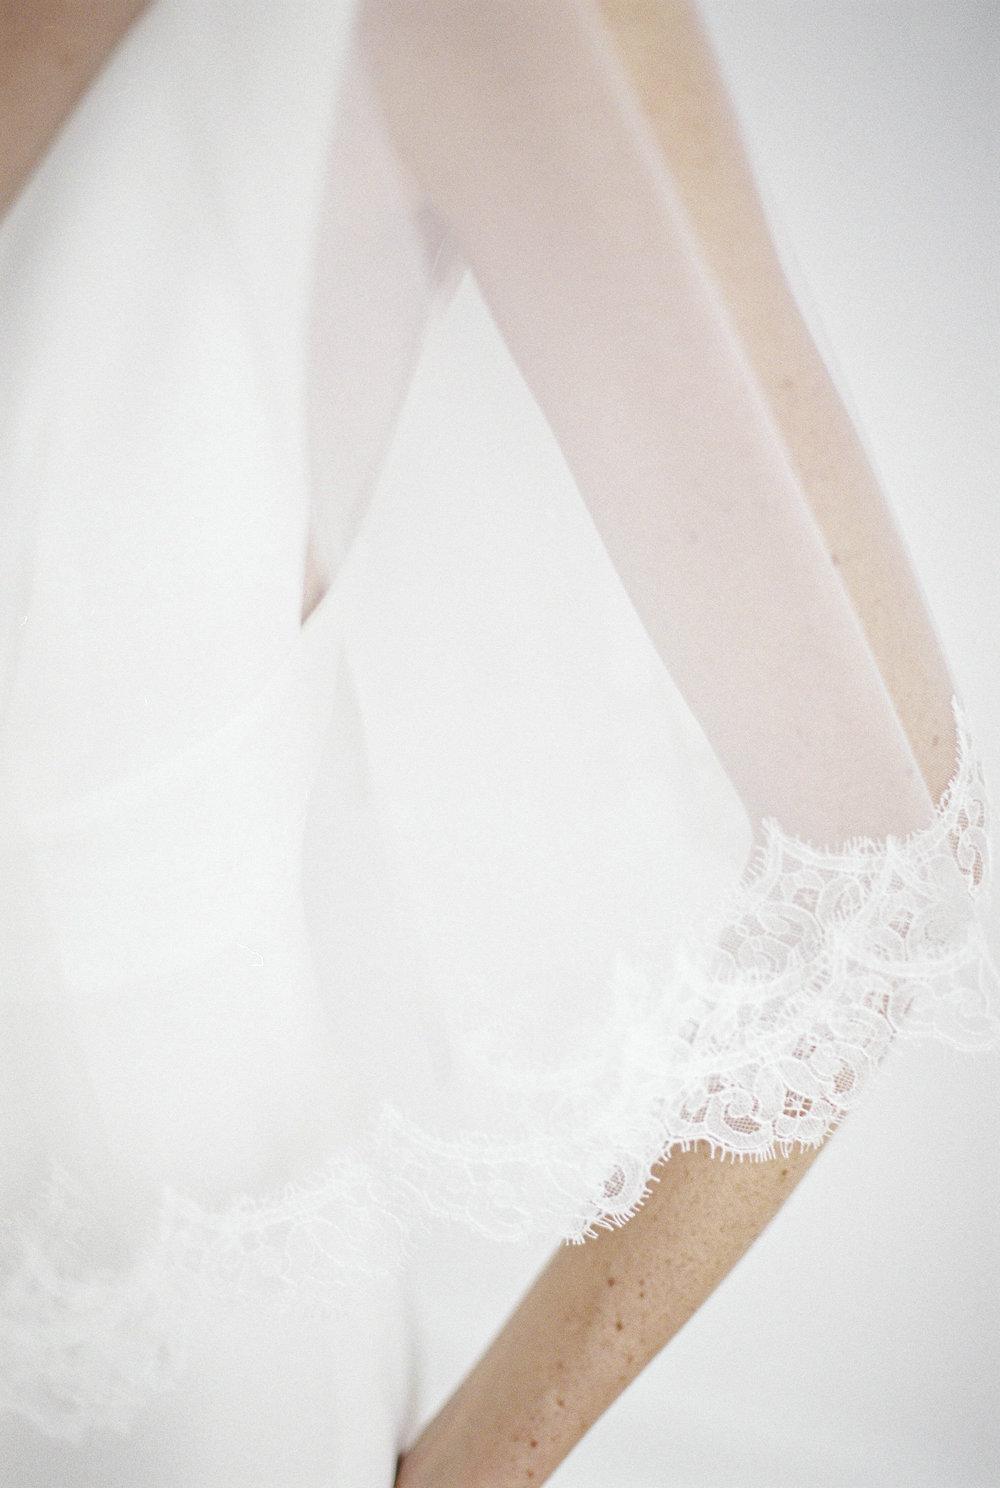 Ludovic Grau-Mingot - Film Photographer - Talitha - Wedding dresses - Collection 2019-249.jpg